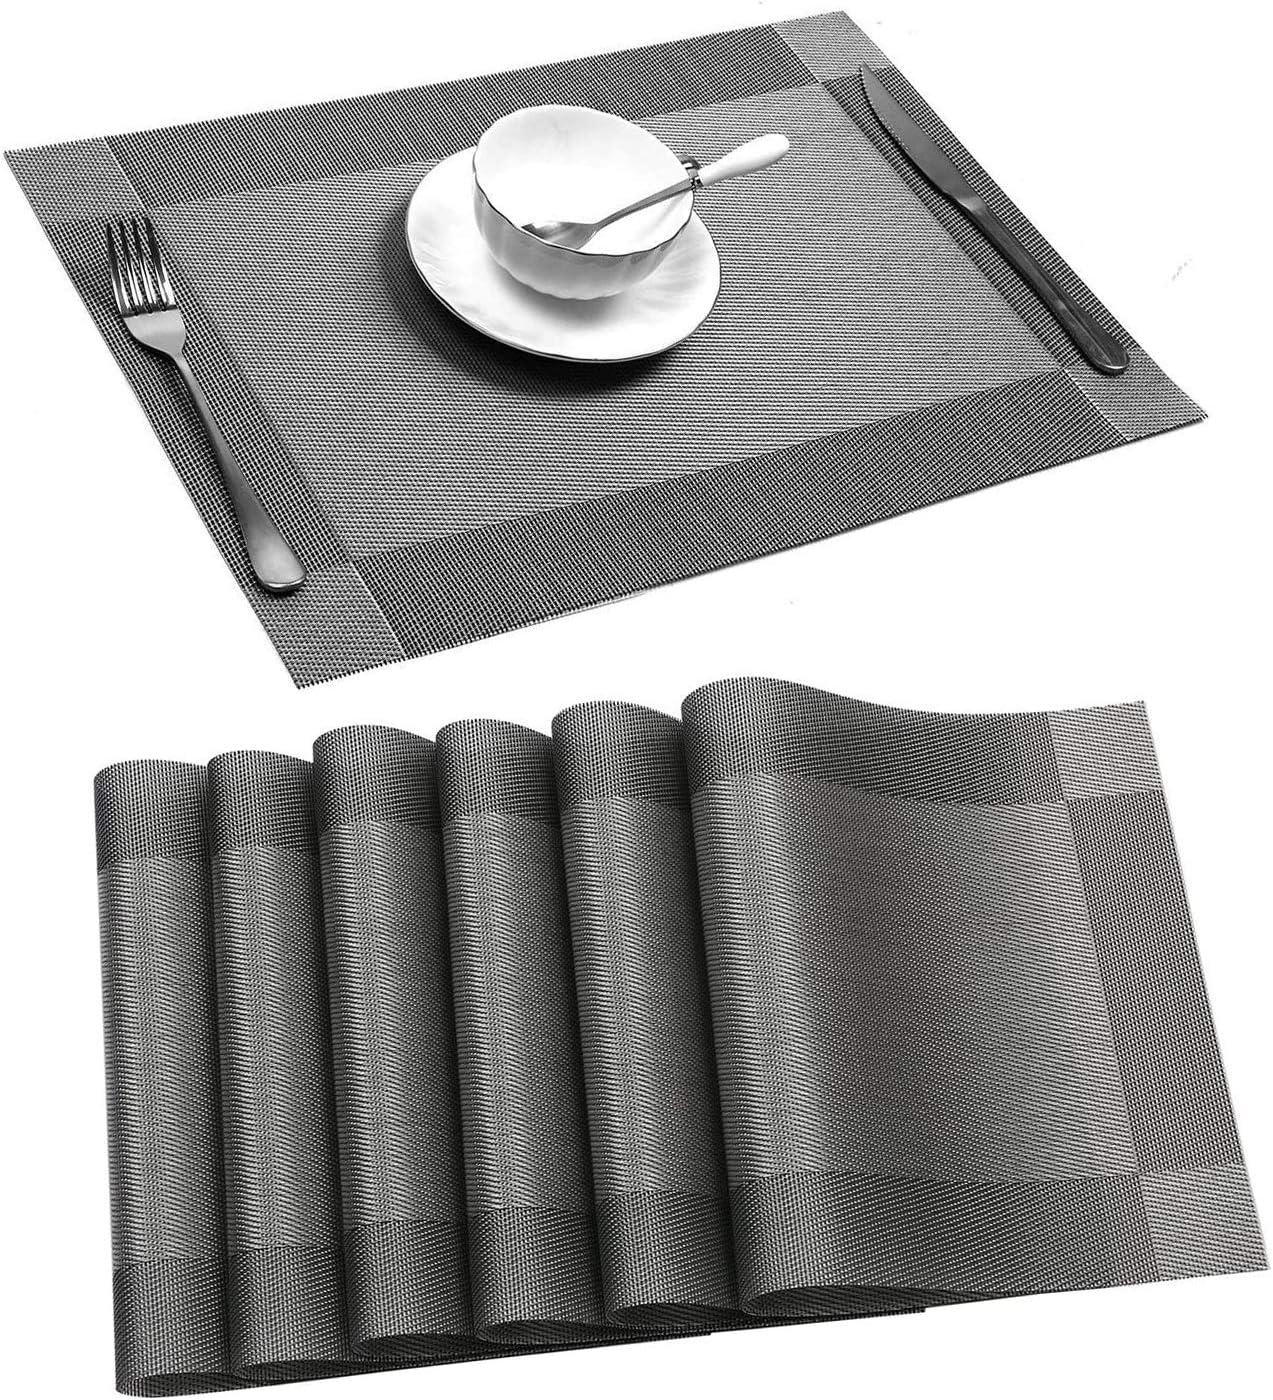 Hauswahl Placemats, Heat-Resistant Placemats Stain Resistant Anti-Skid Washable PVC Table Mats Woven Vinyl Placemats (B-Grey-6pcs)